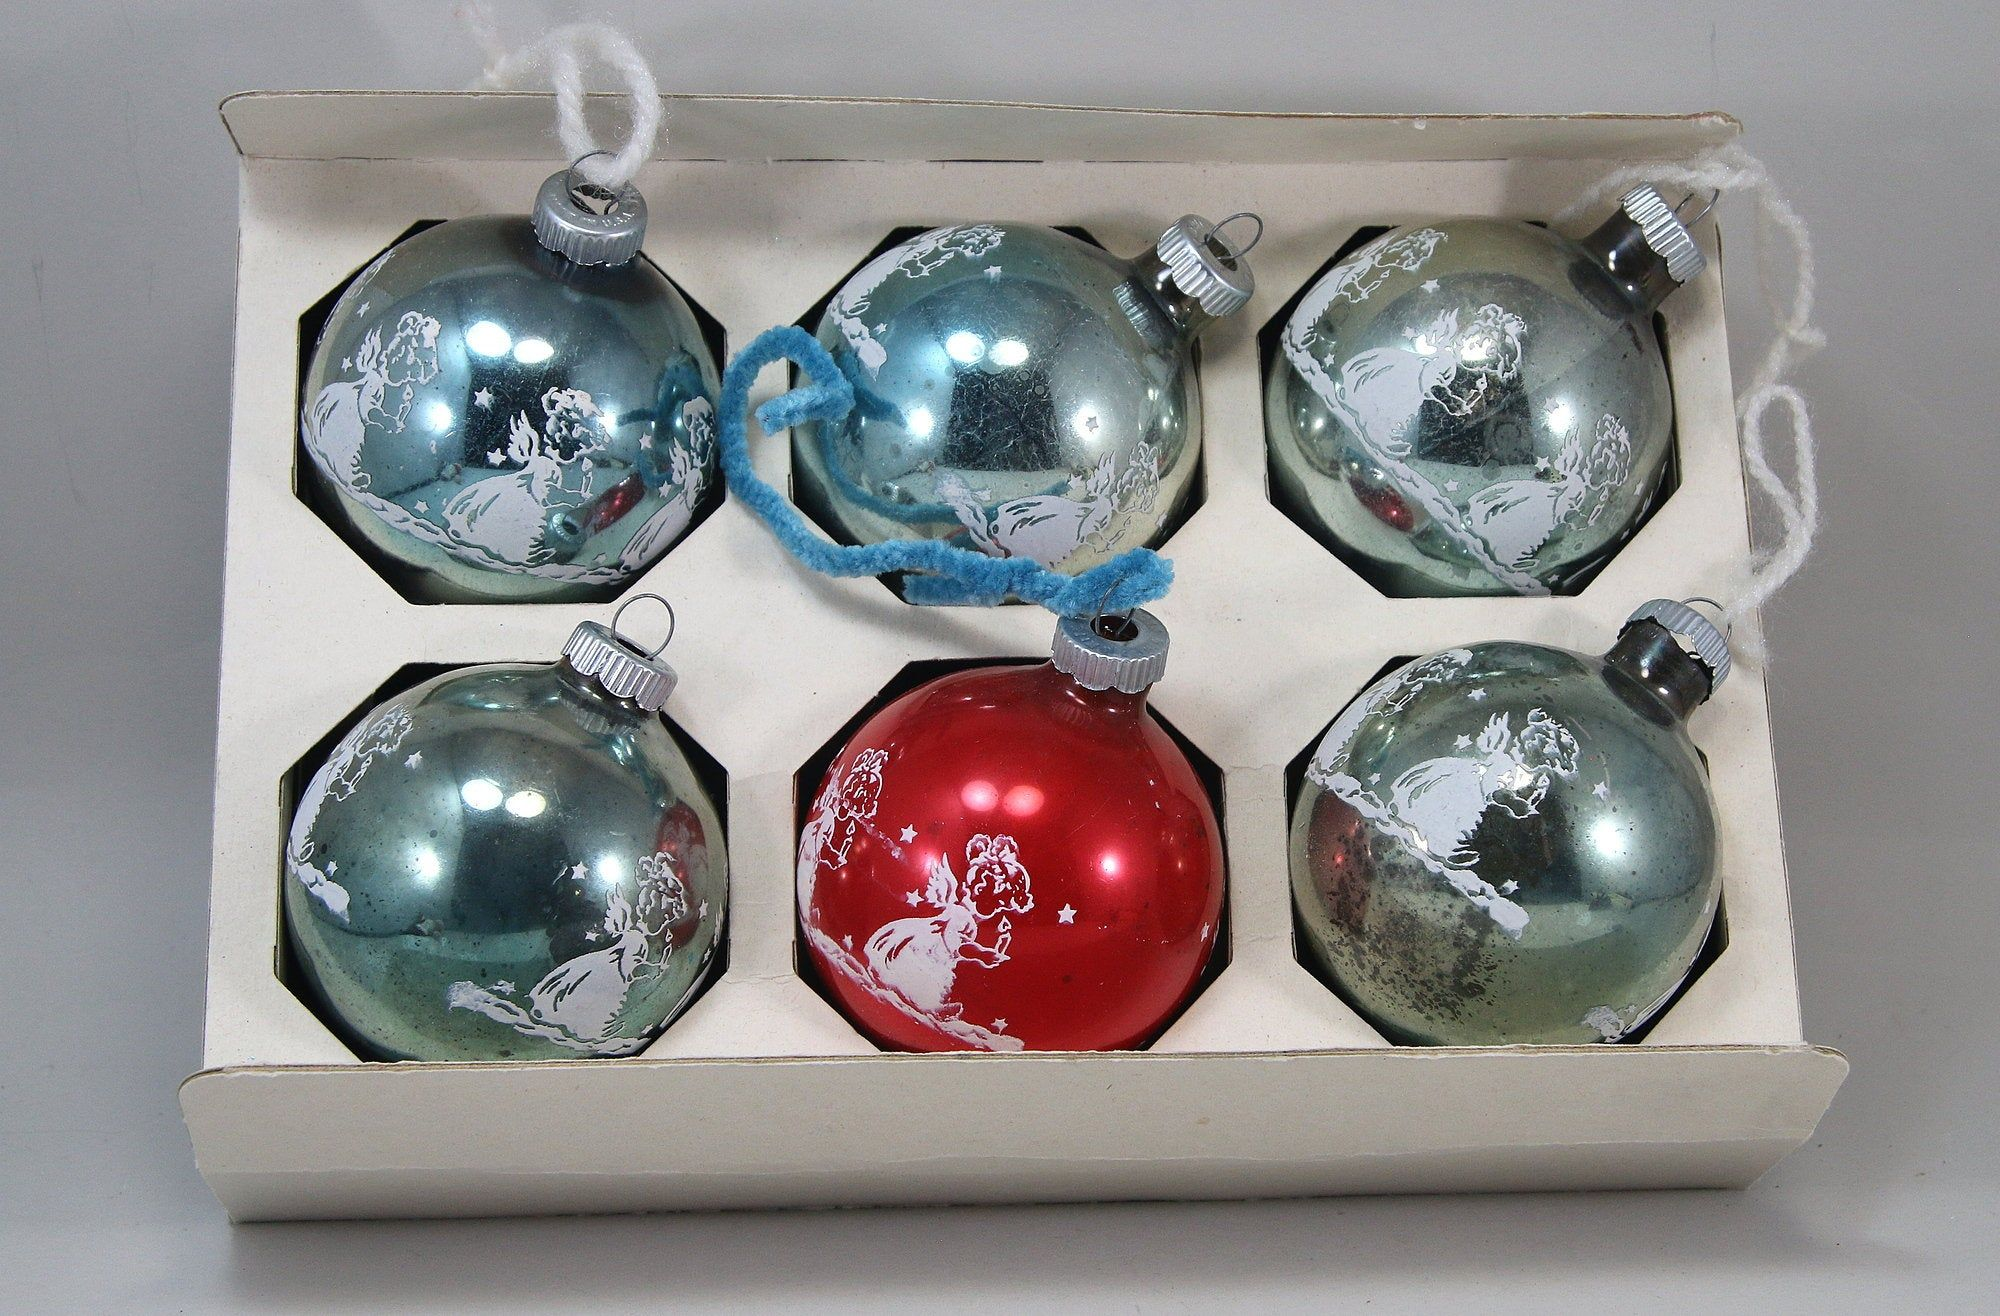 Christmas 2020 Vs Christmas 1970s Vintage Shiny Brite Angel Boxed Christmas Ornaments 1970s   Etsy